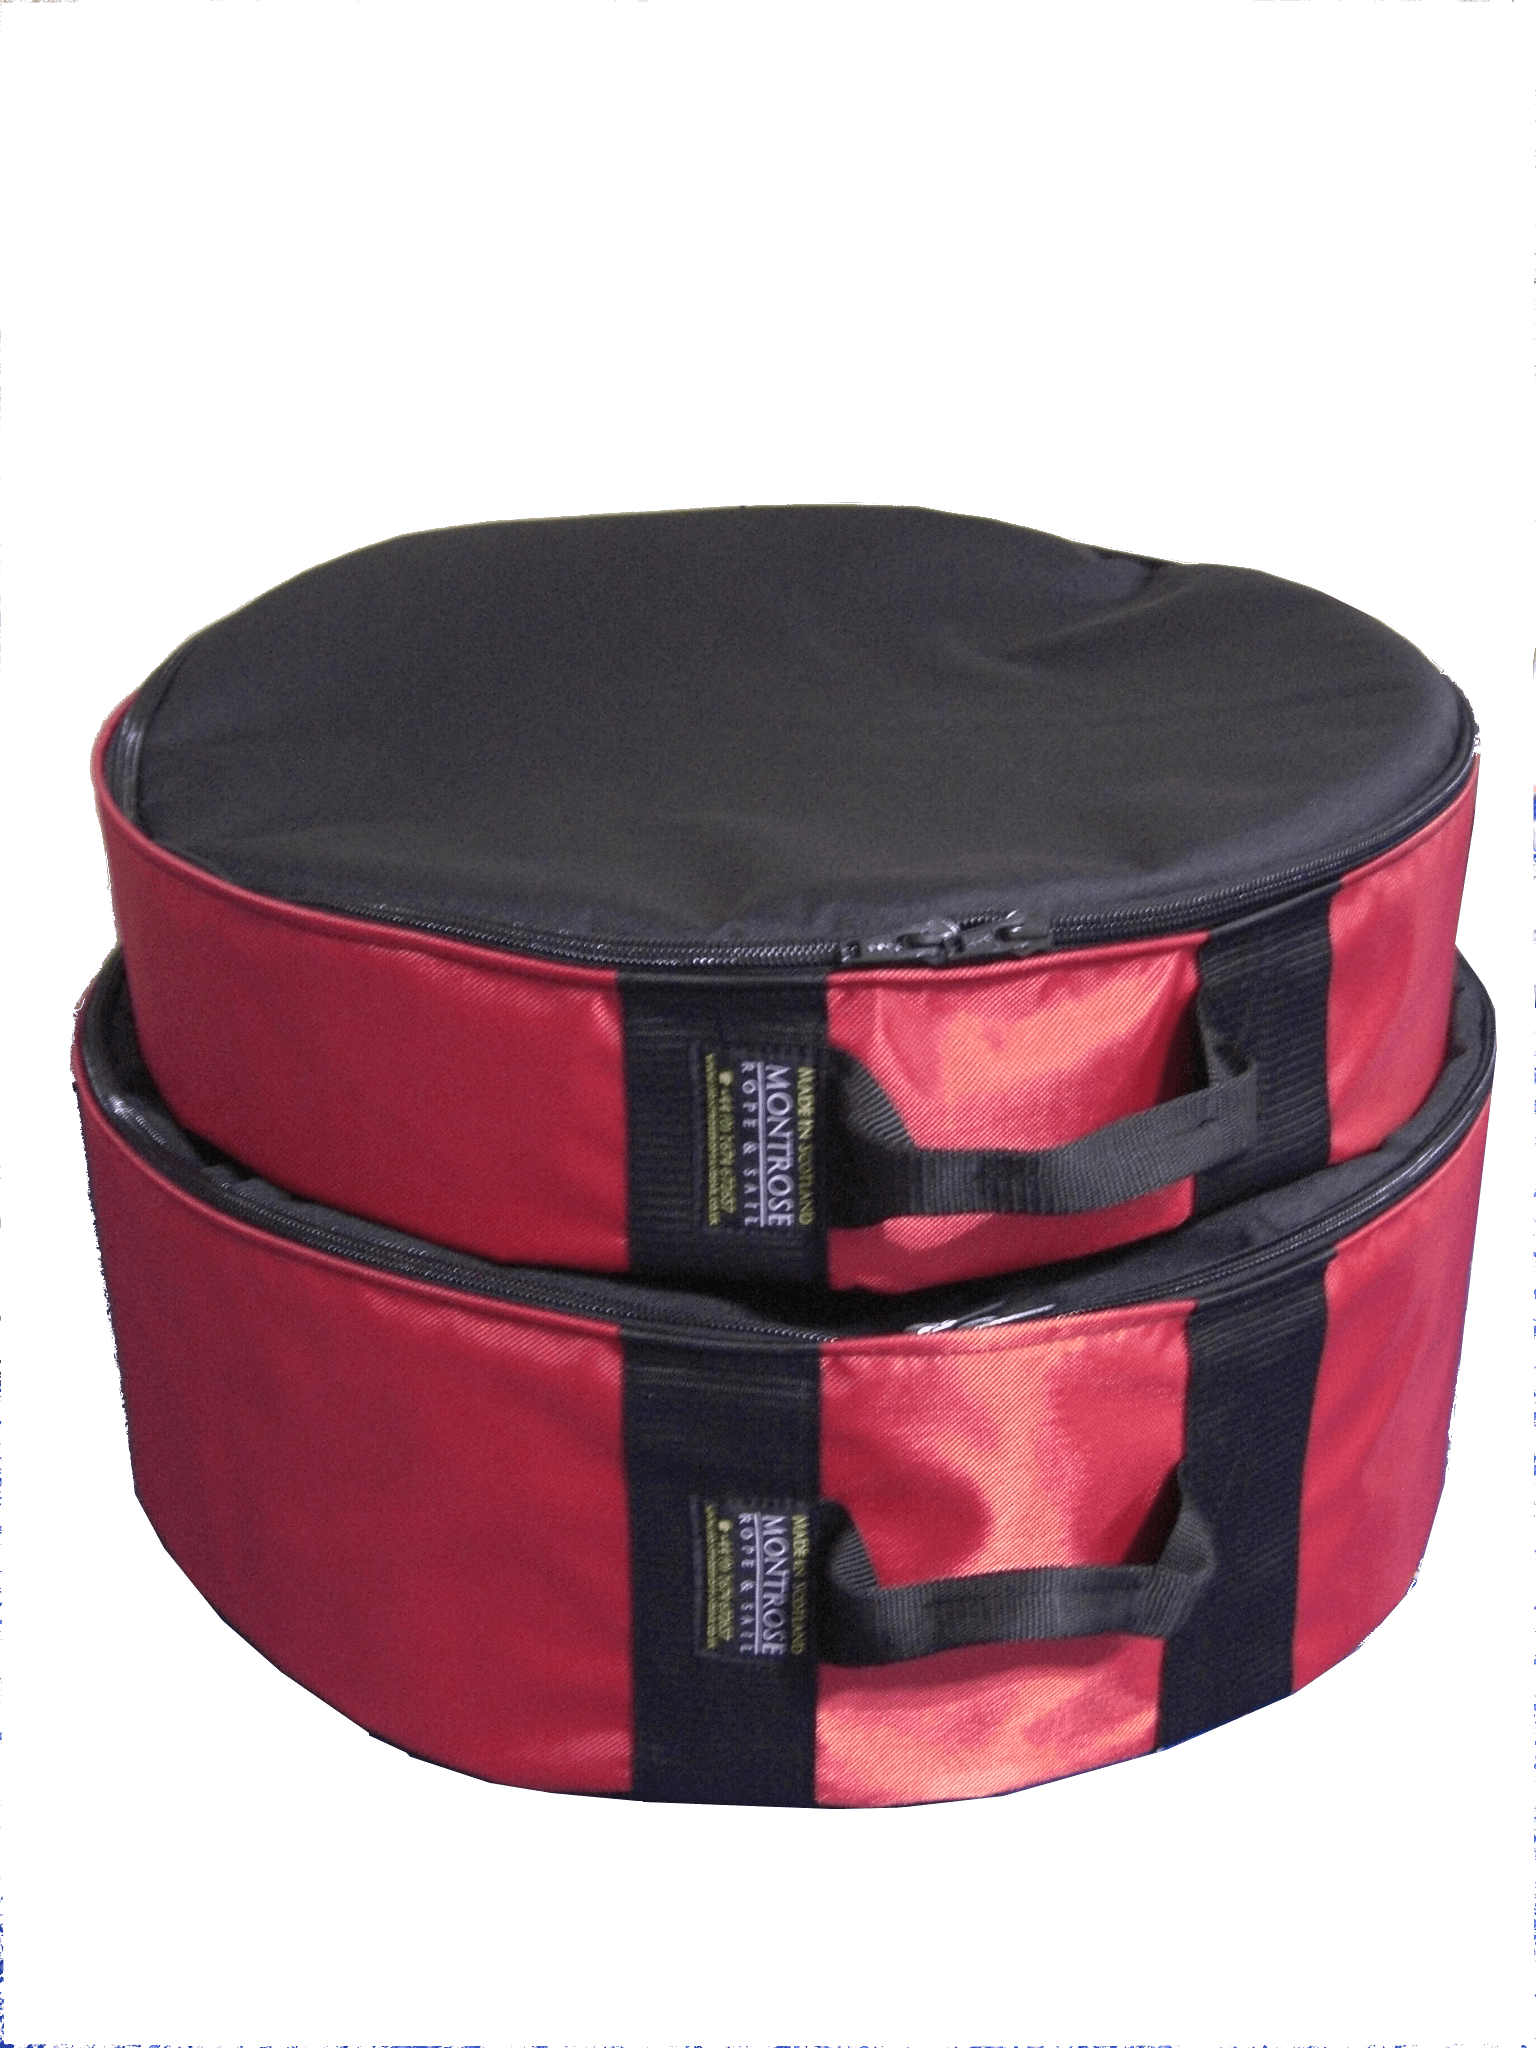 Motorcycle Wheel Bag Custom Pvc Travel Bags From Montrose Bag Co